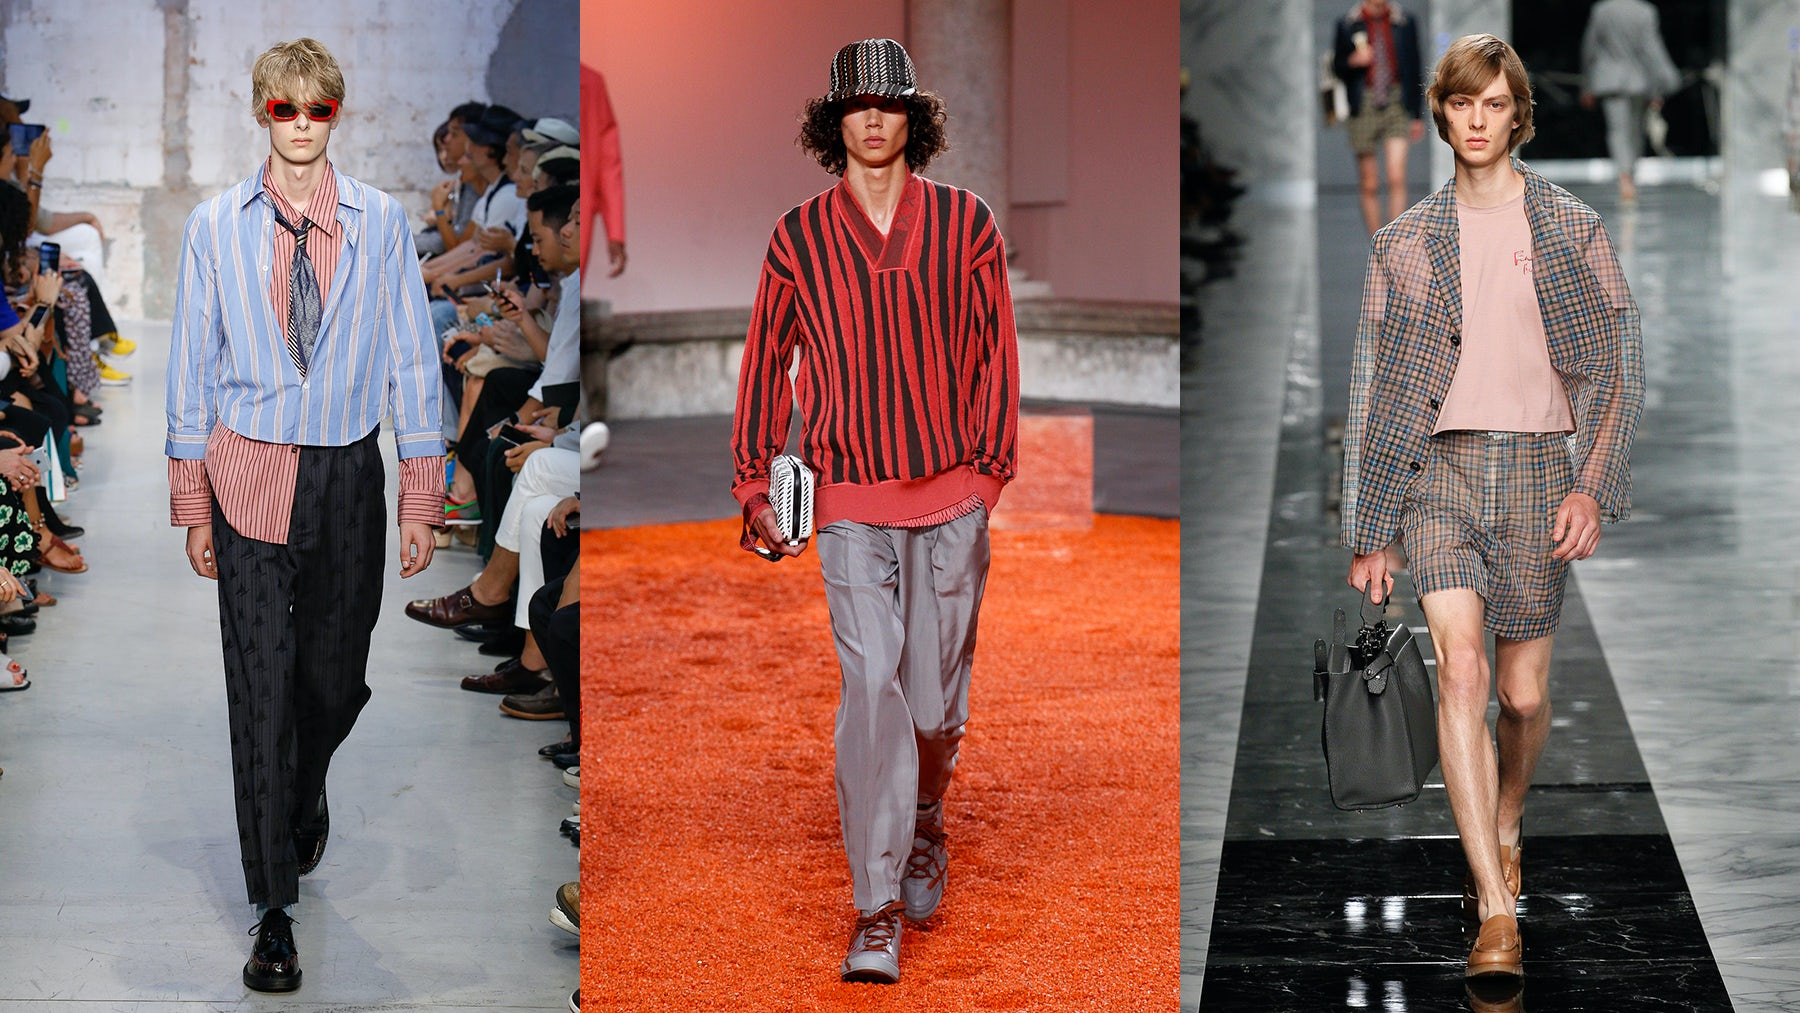 Looks from Marni, Ermenegildo Zegna and Fendi Spring 2018 menswear collections   Source: InDigital